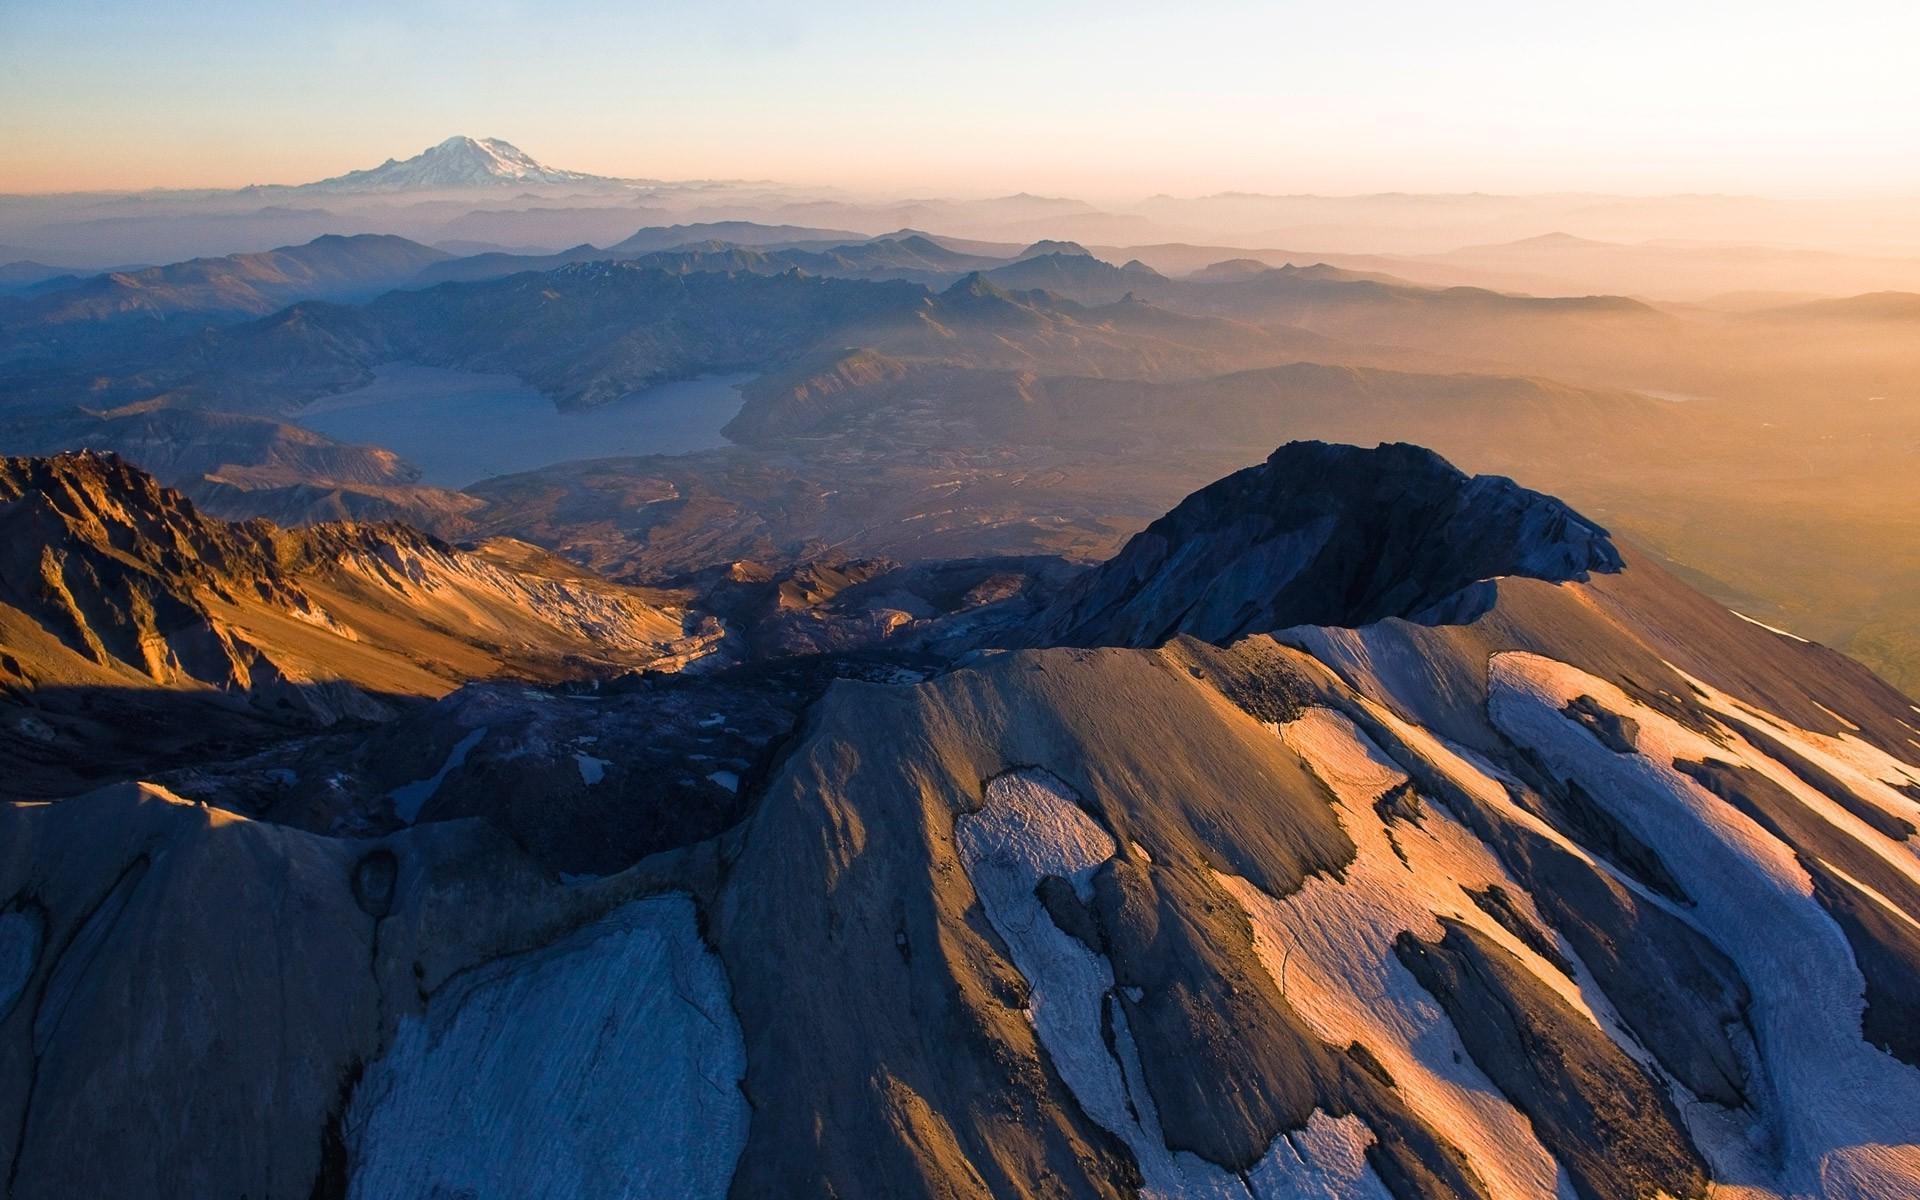 mountain Mount St Helens Sunrise Lake Snowy Peak Mist 1920x1200